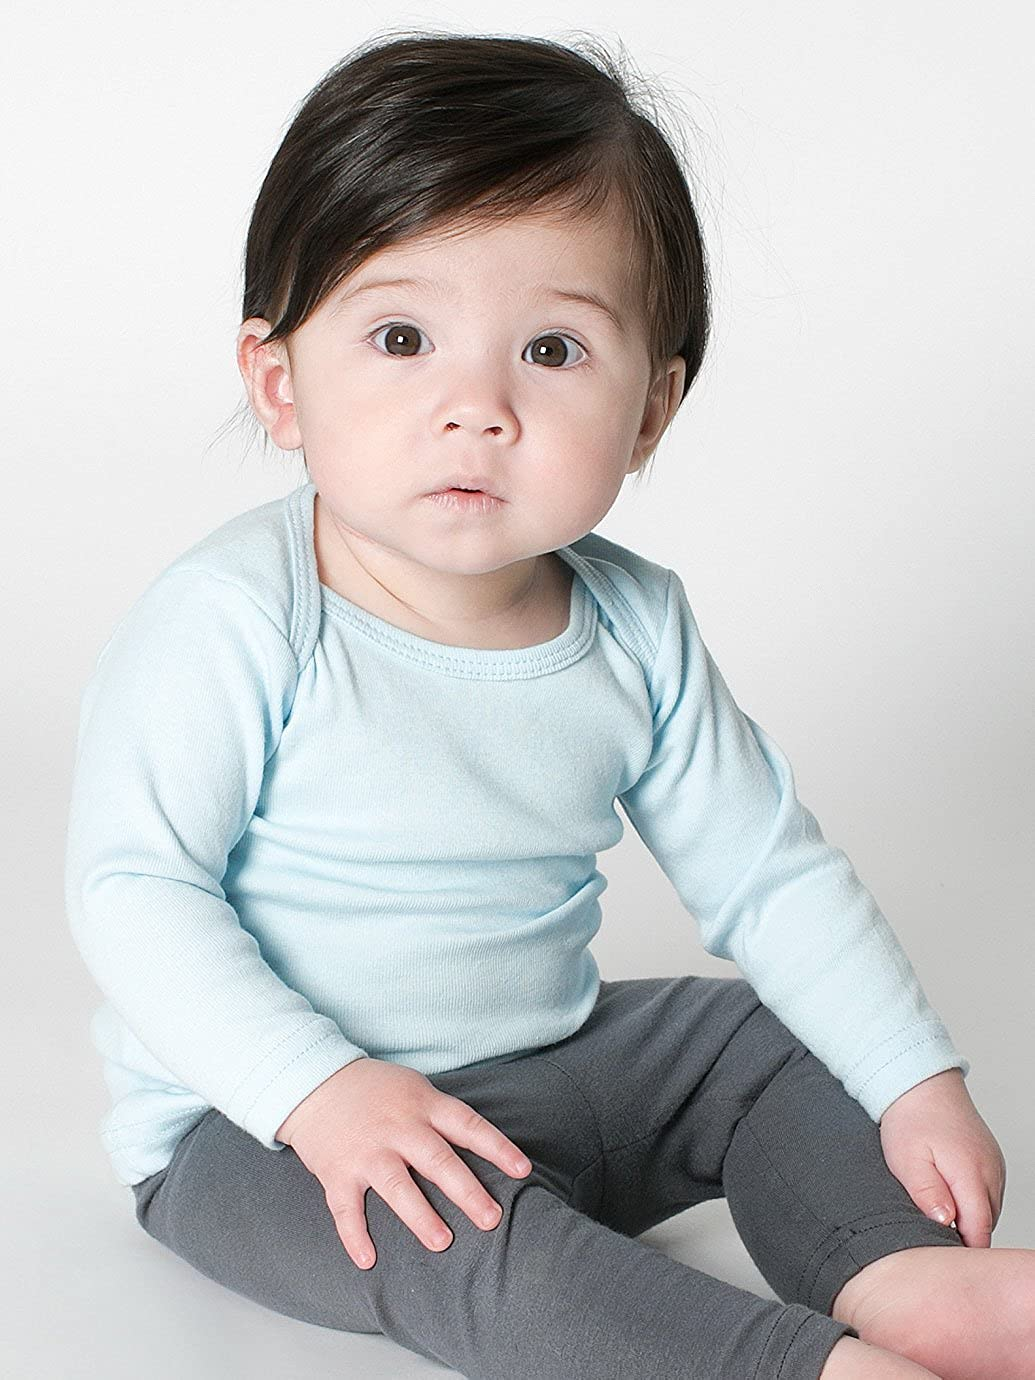 American Apparel Kids Infant Baby Rib Long Sleeve Lap T-Shirt Size 6-12M Baby